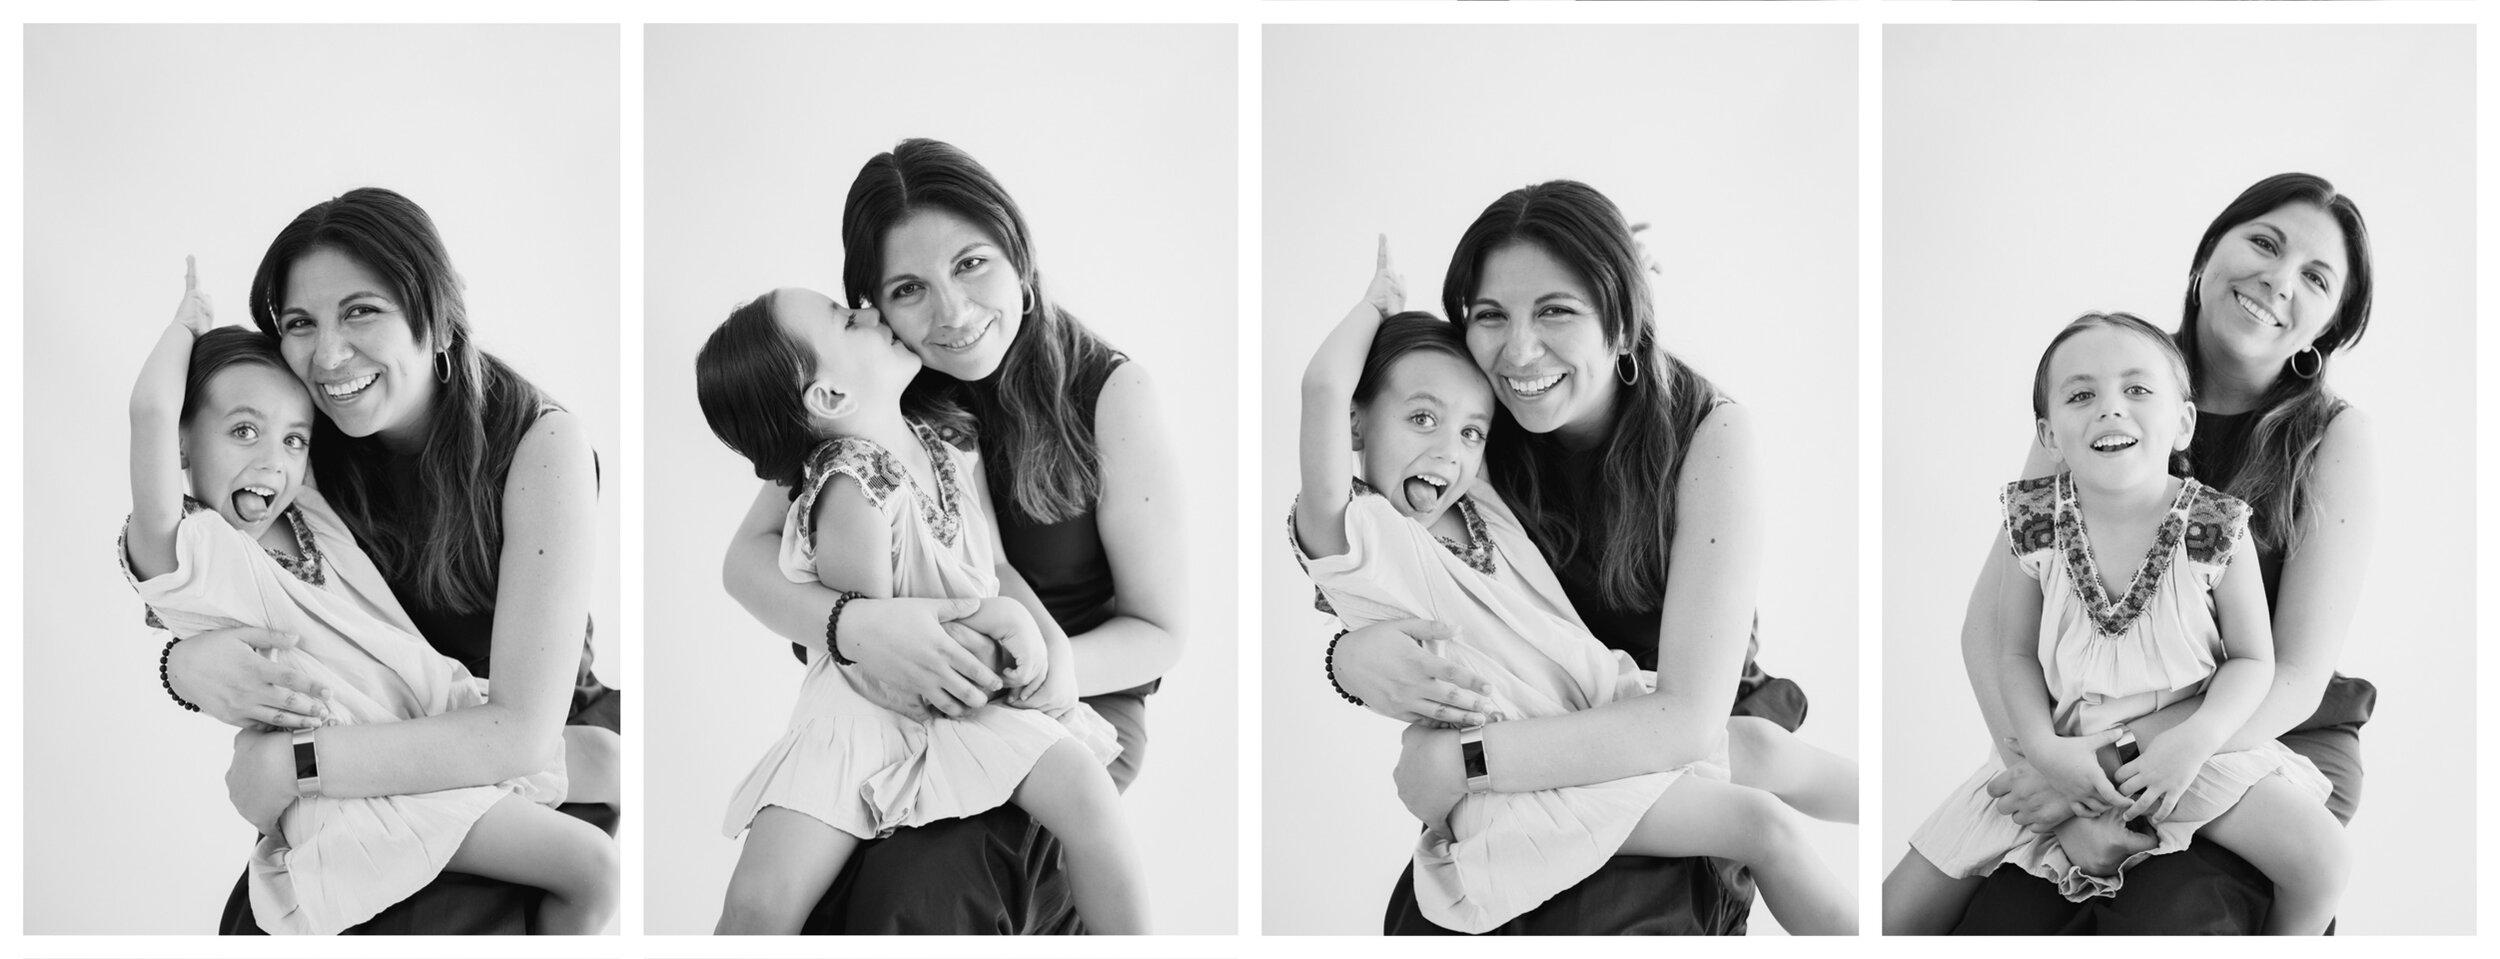 photo-famille-studio-paris-ines-aramburo.jpg